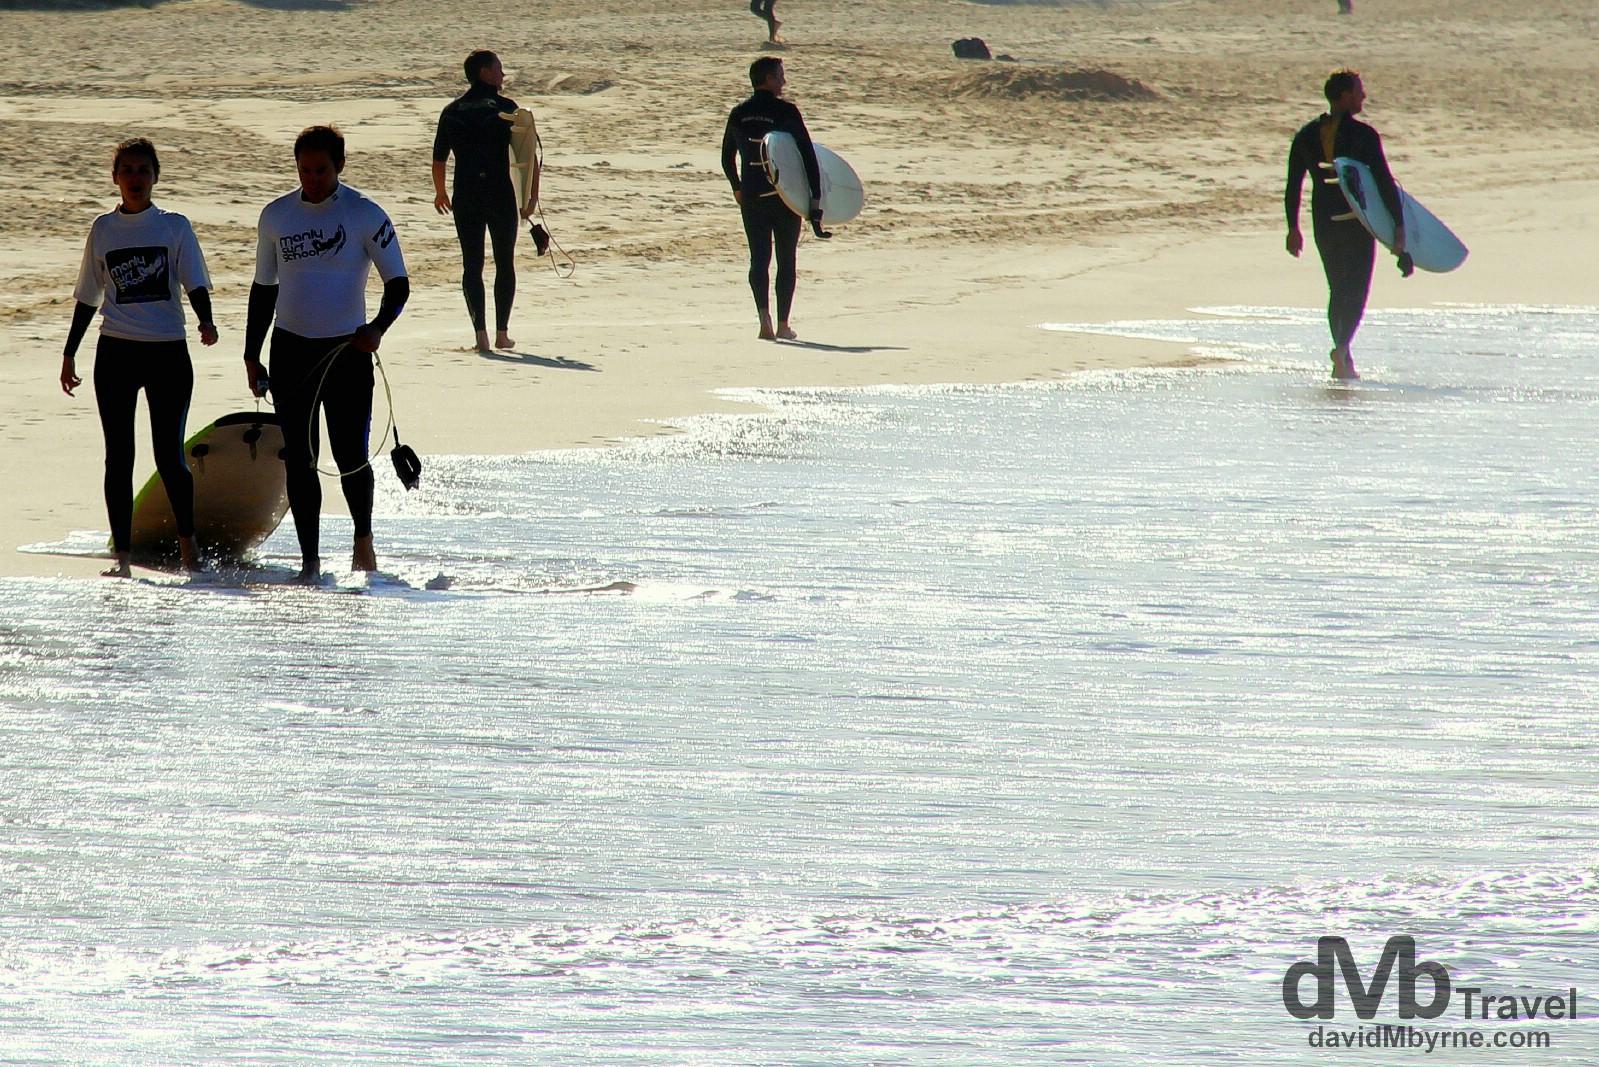 Manly Beach, Sydney, Australia. June 8th 2012.